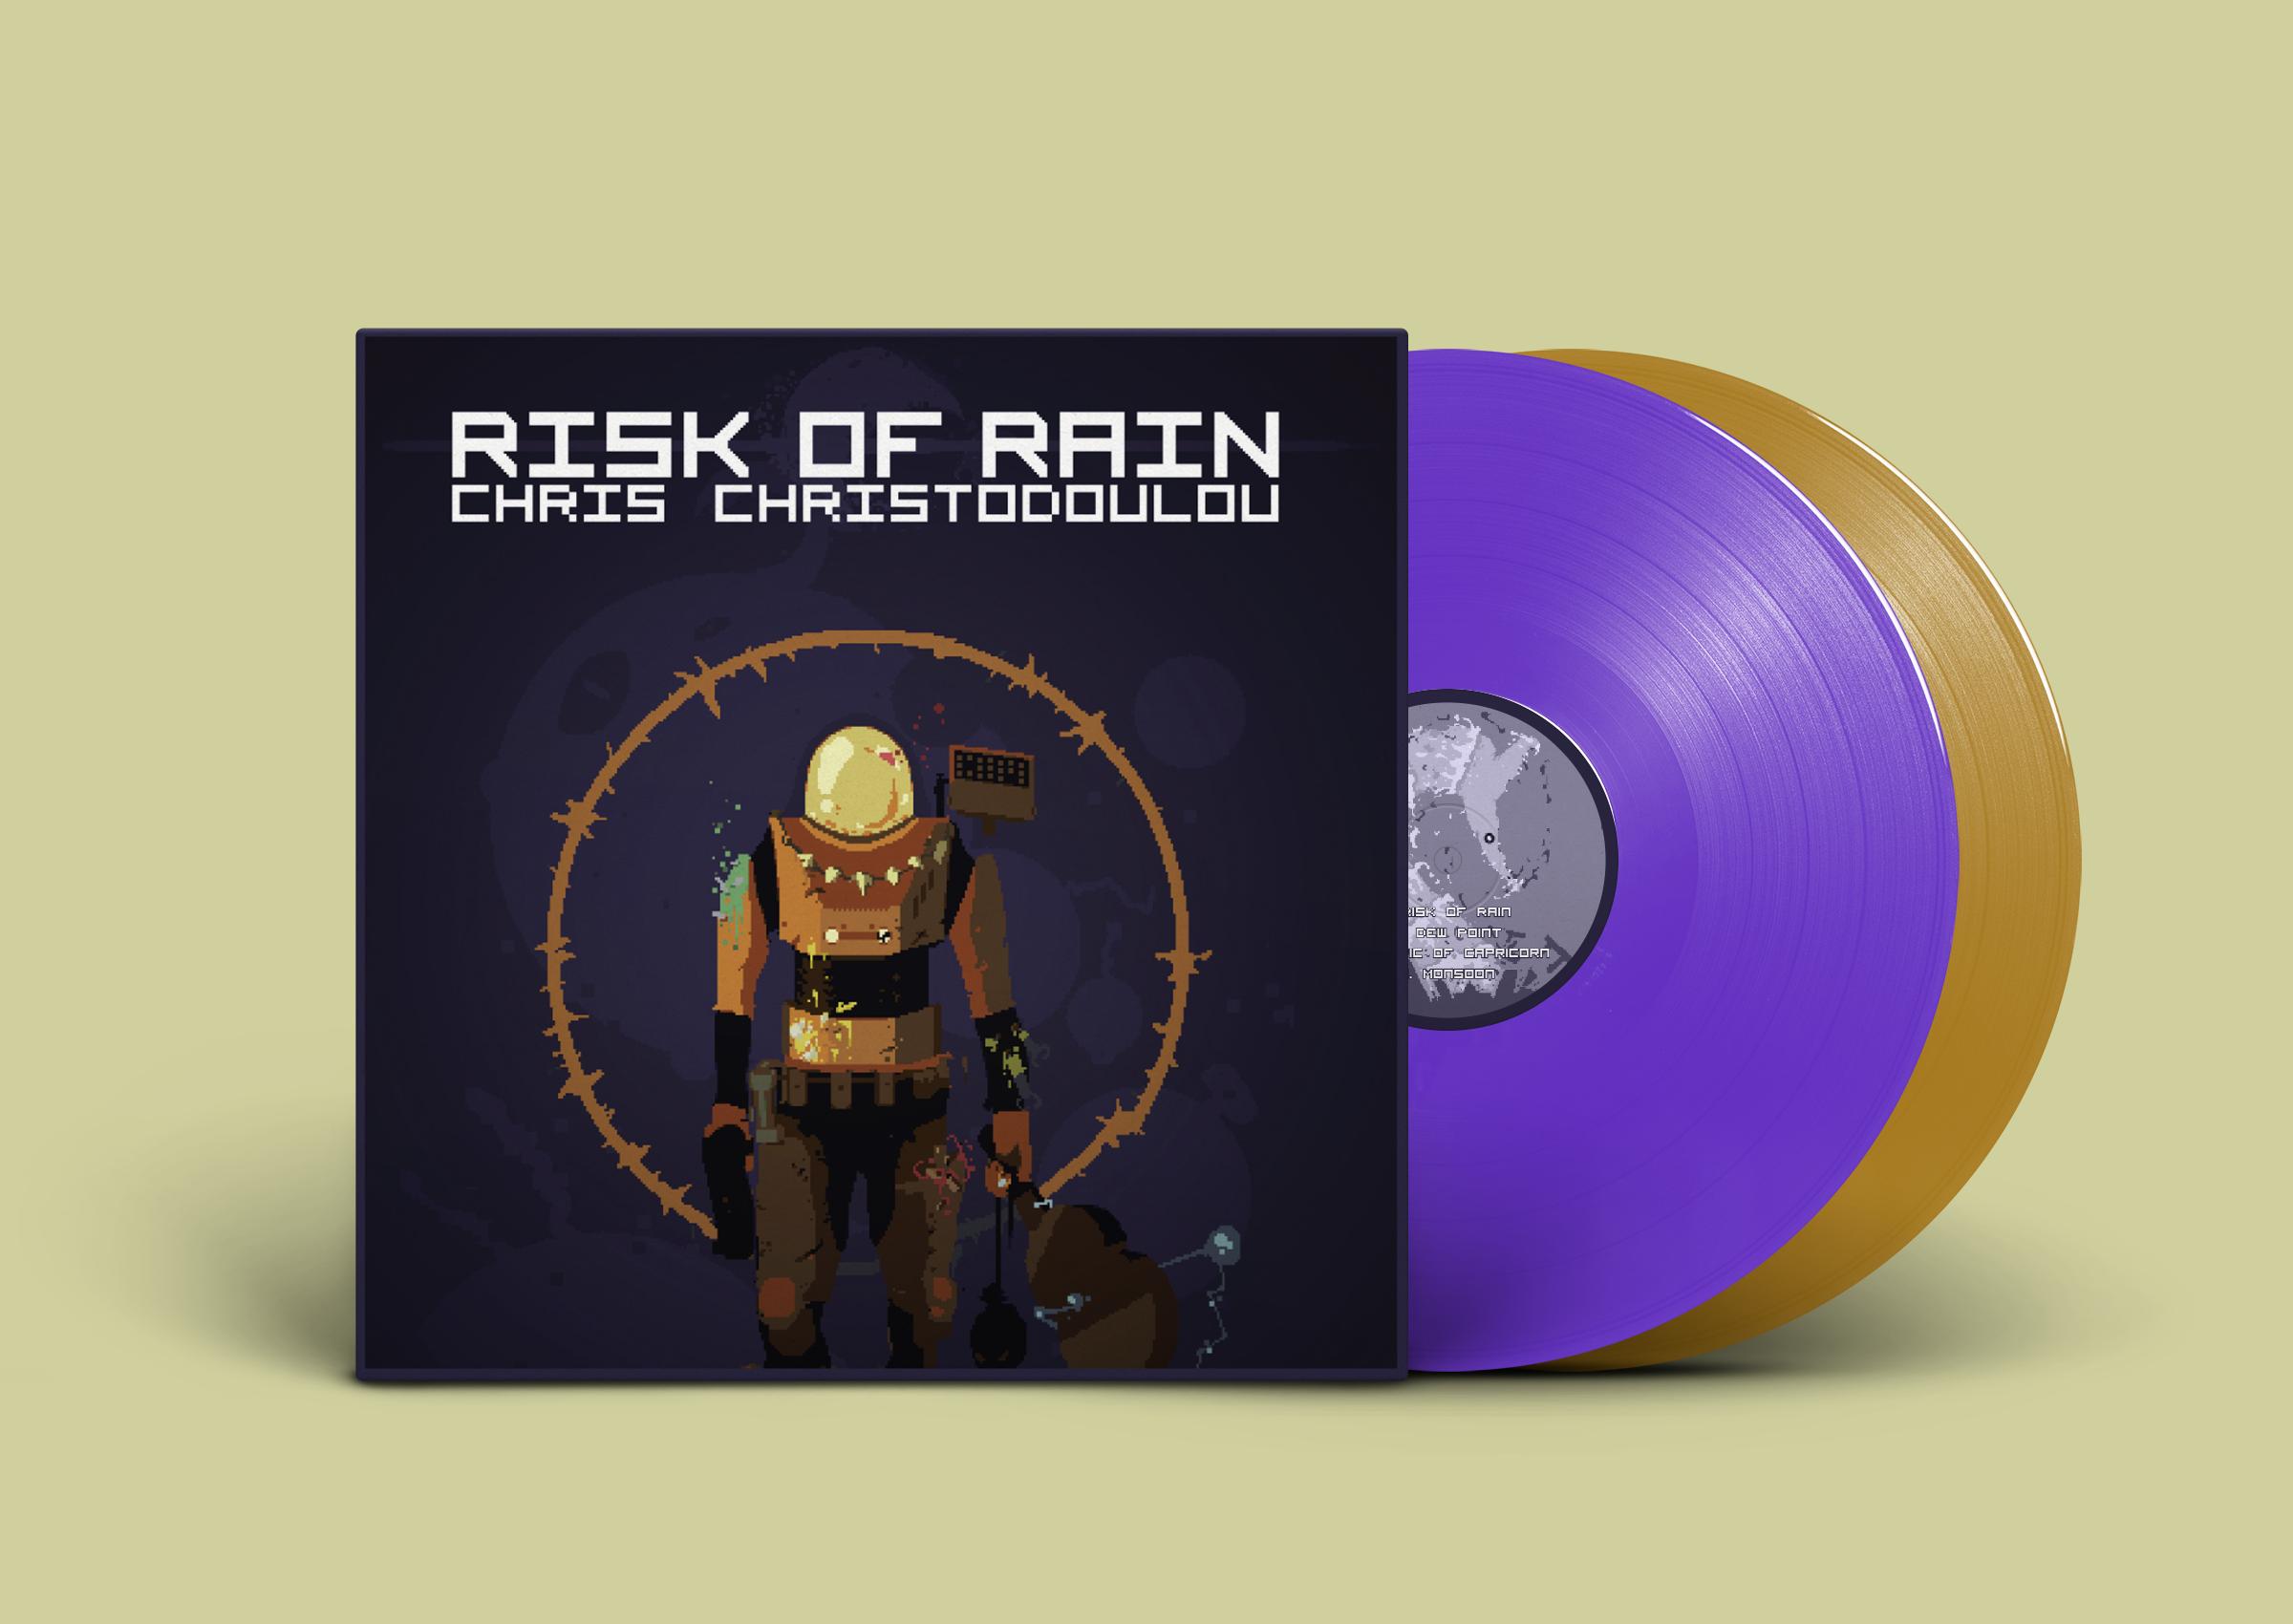 Risk Of Rain - Cover + Records Mockup